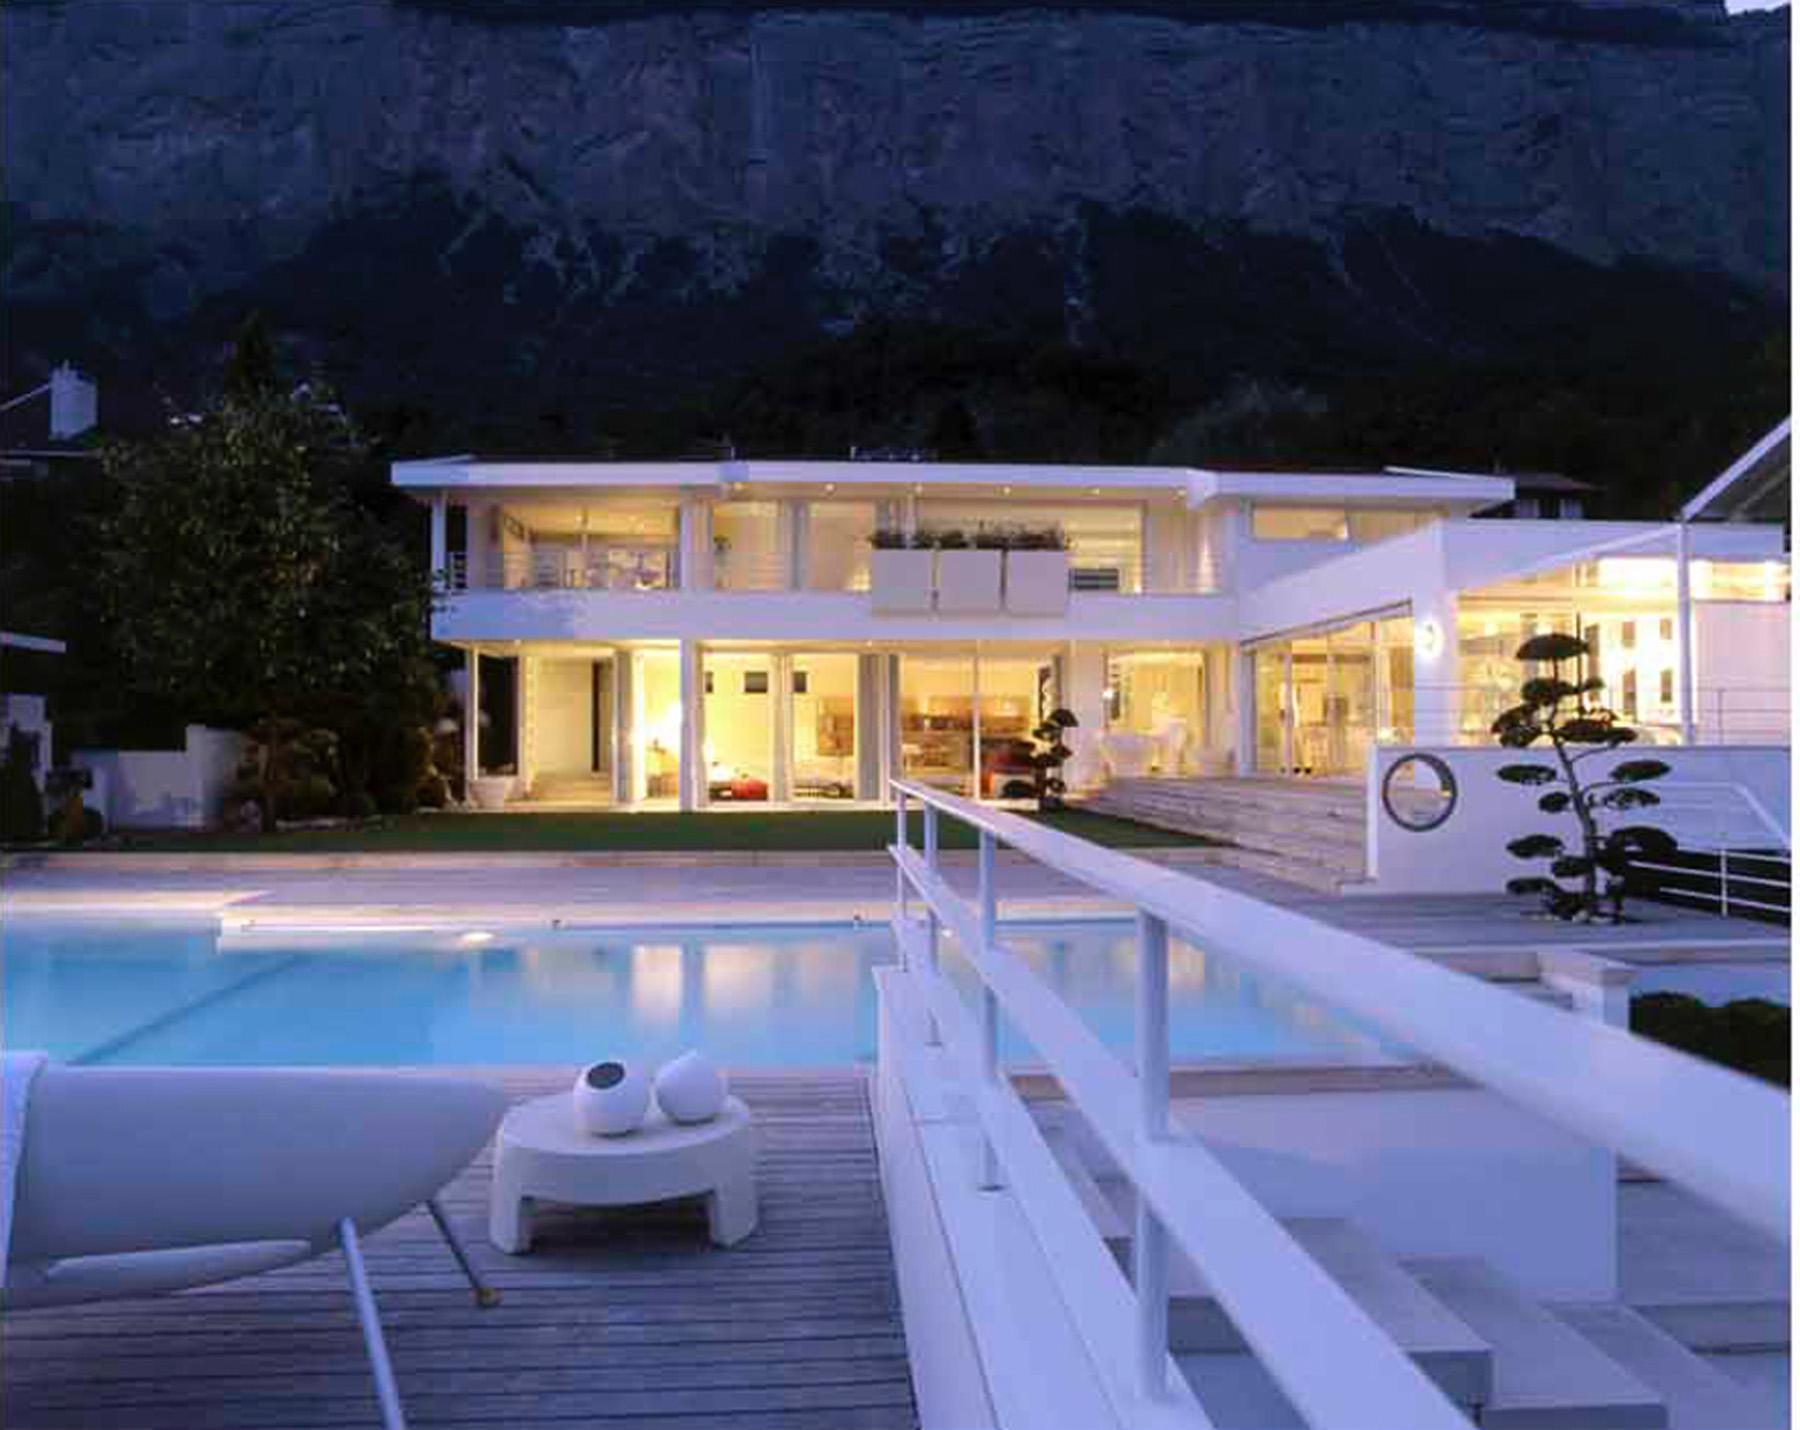 Janik architecte maison individuelle meylan 2 for Architecte grenoble maison individuelle